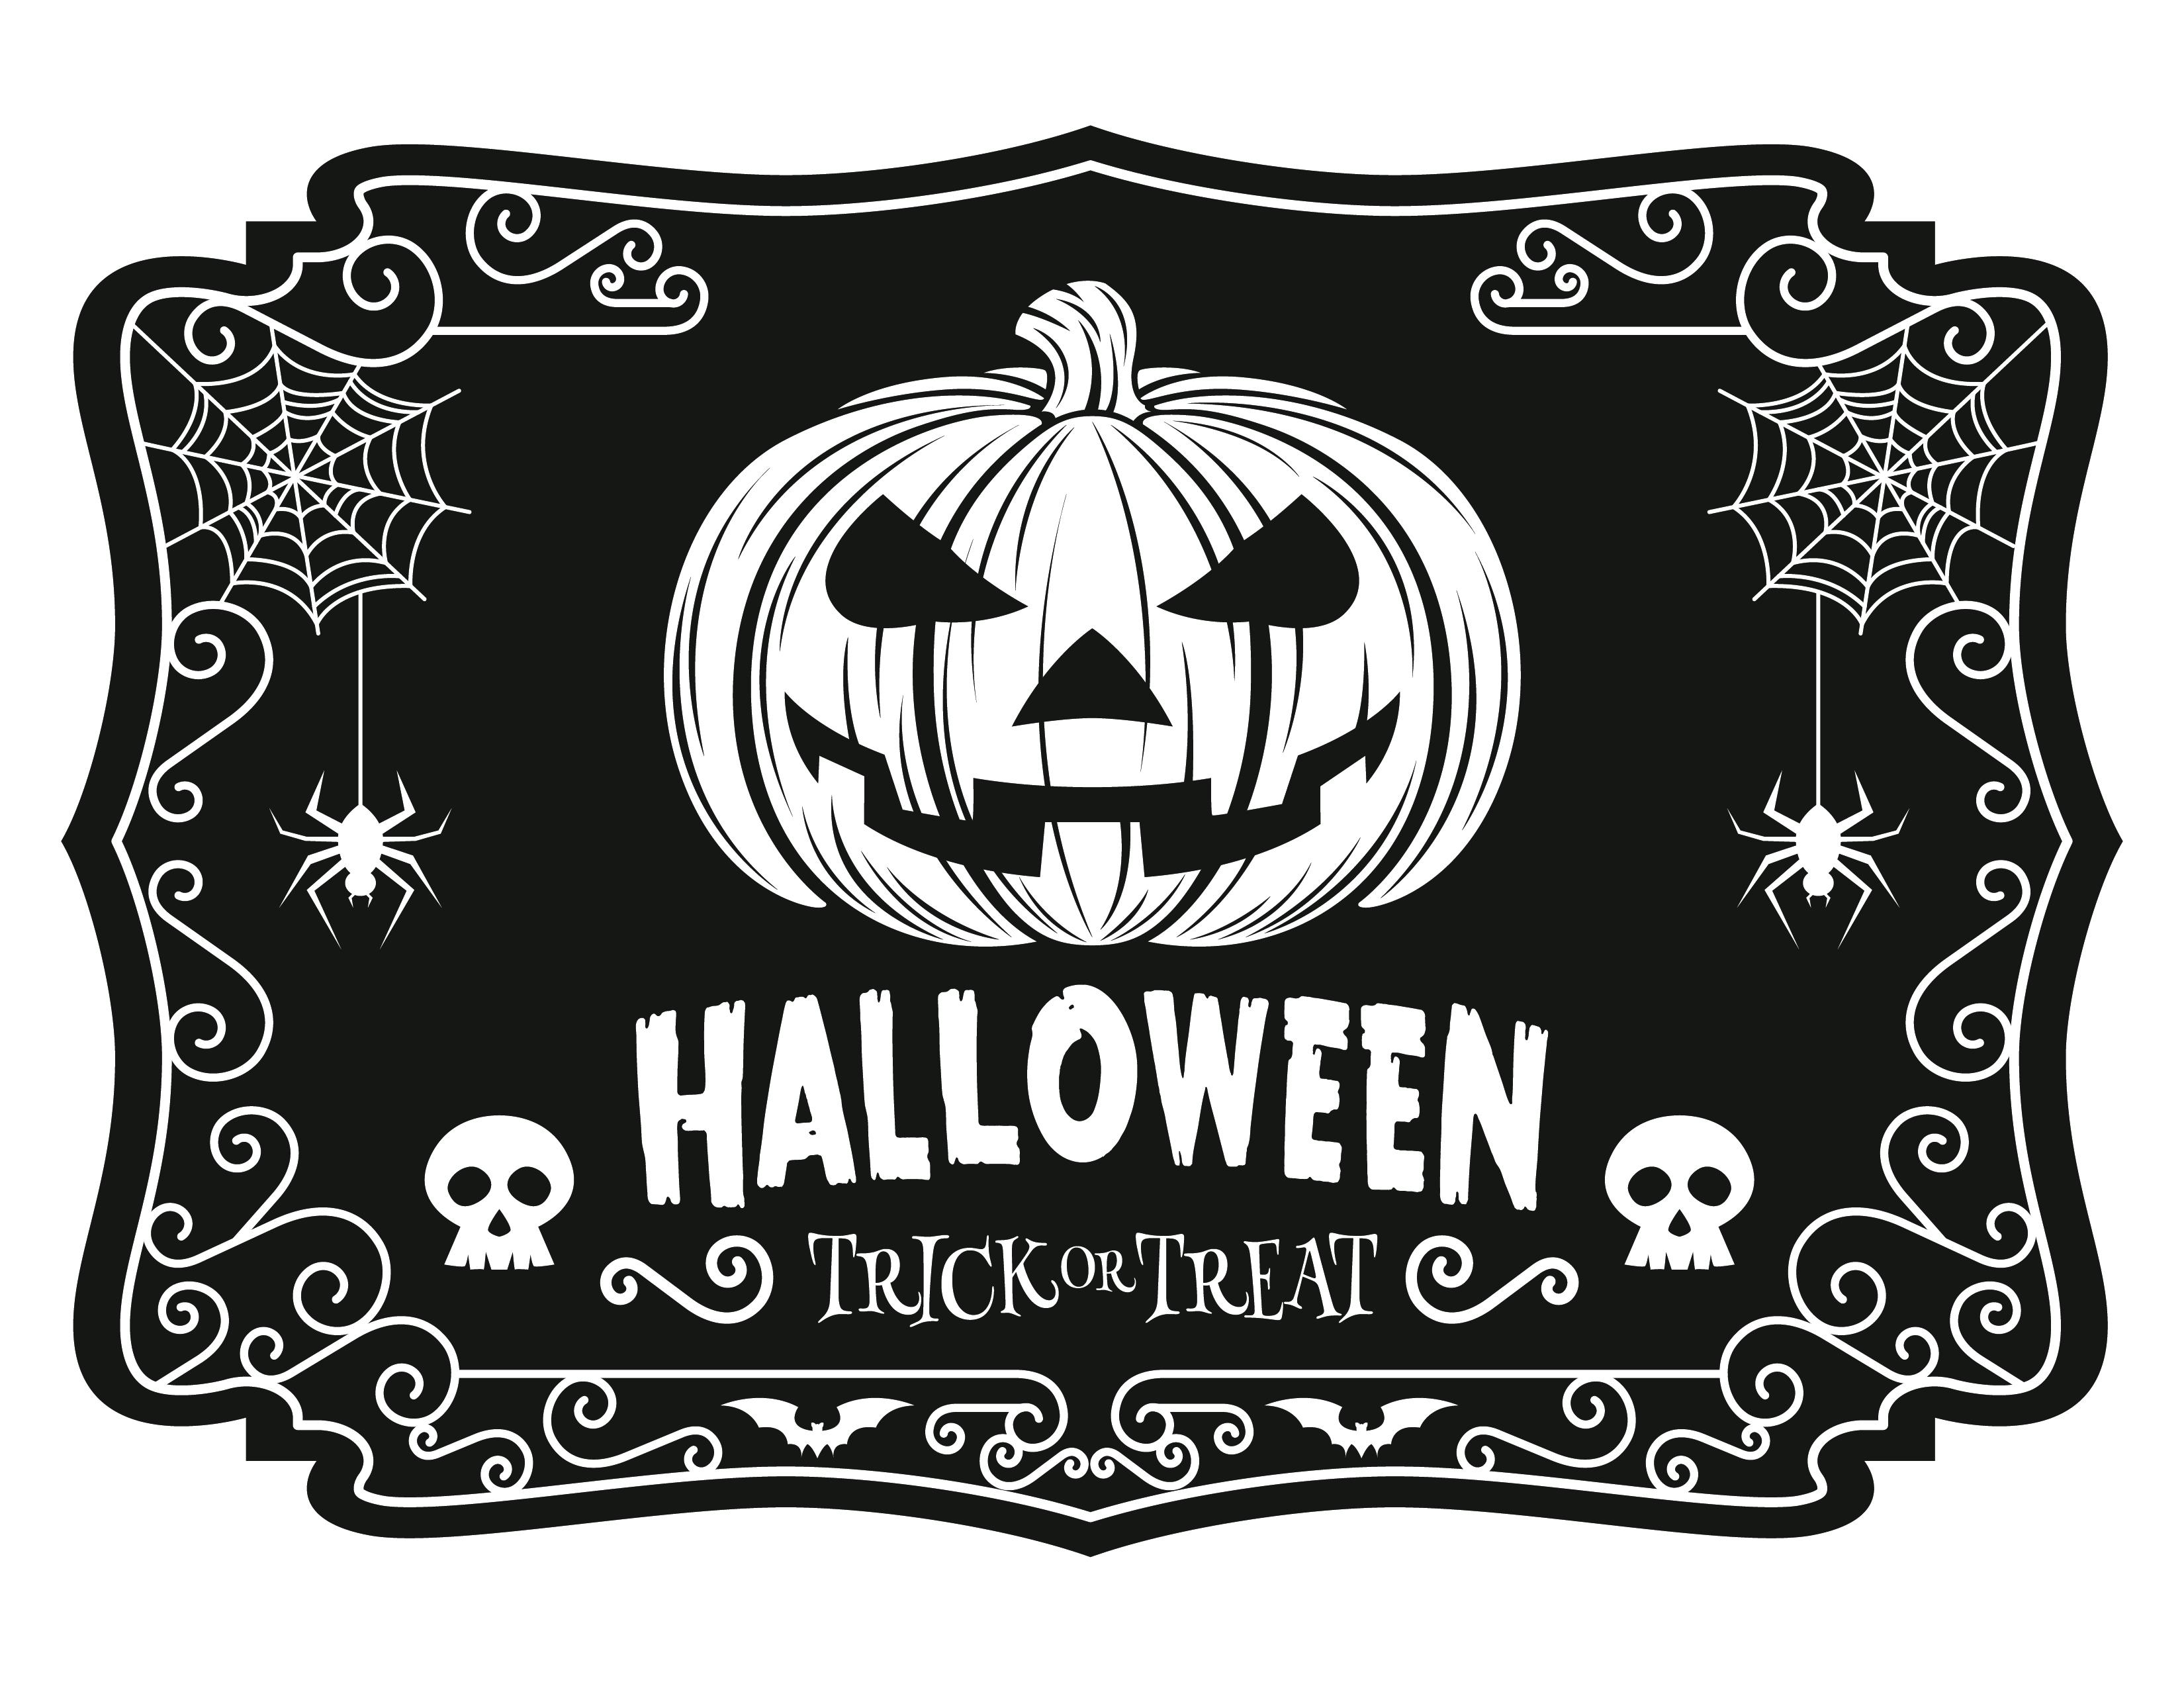 dessin à imprimer Halloween trick or treat - Artherapie.ca